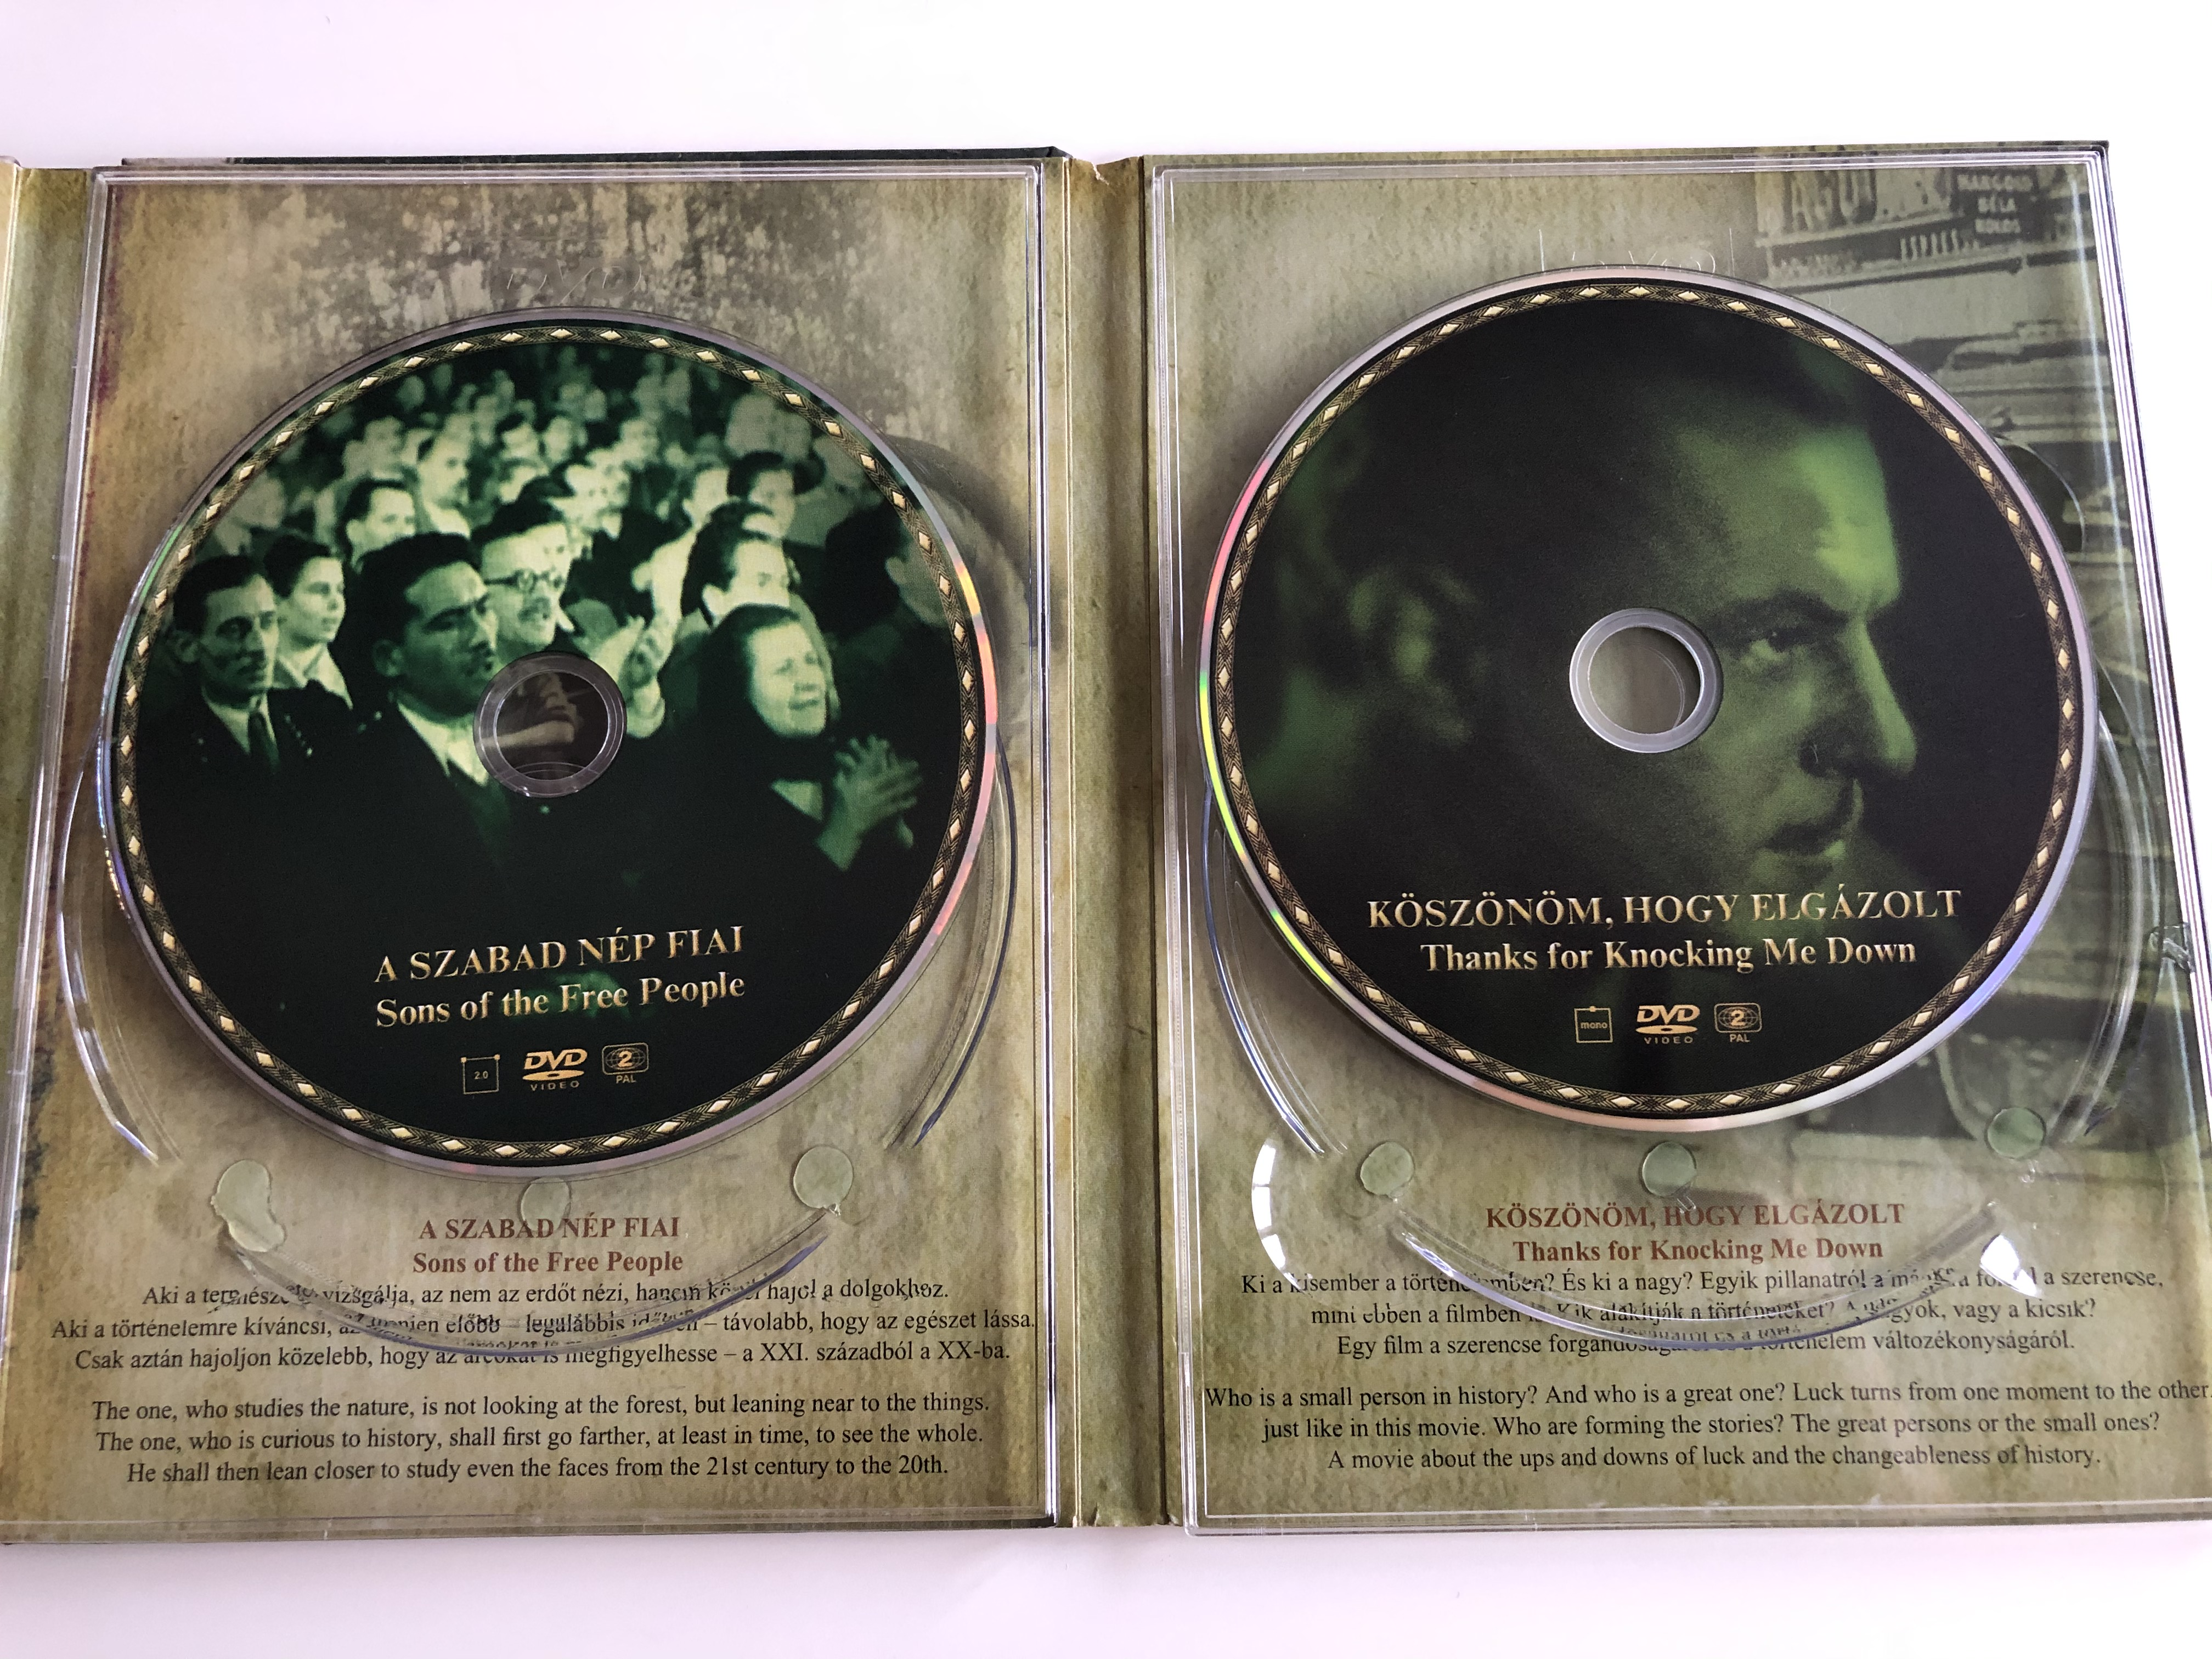 -a-szabad-n-p-fiai-dvd-set-sons-of-the-free-people-xxi.-sz-zad-4-.jpg